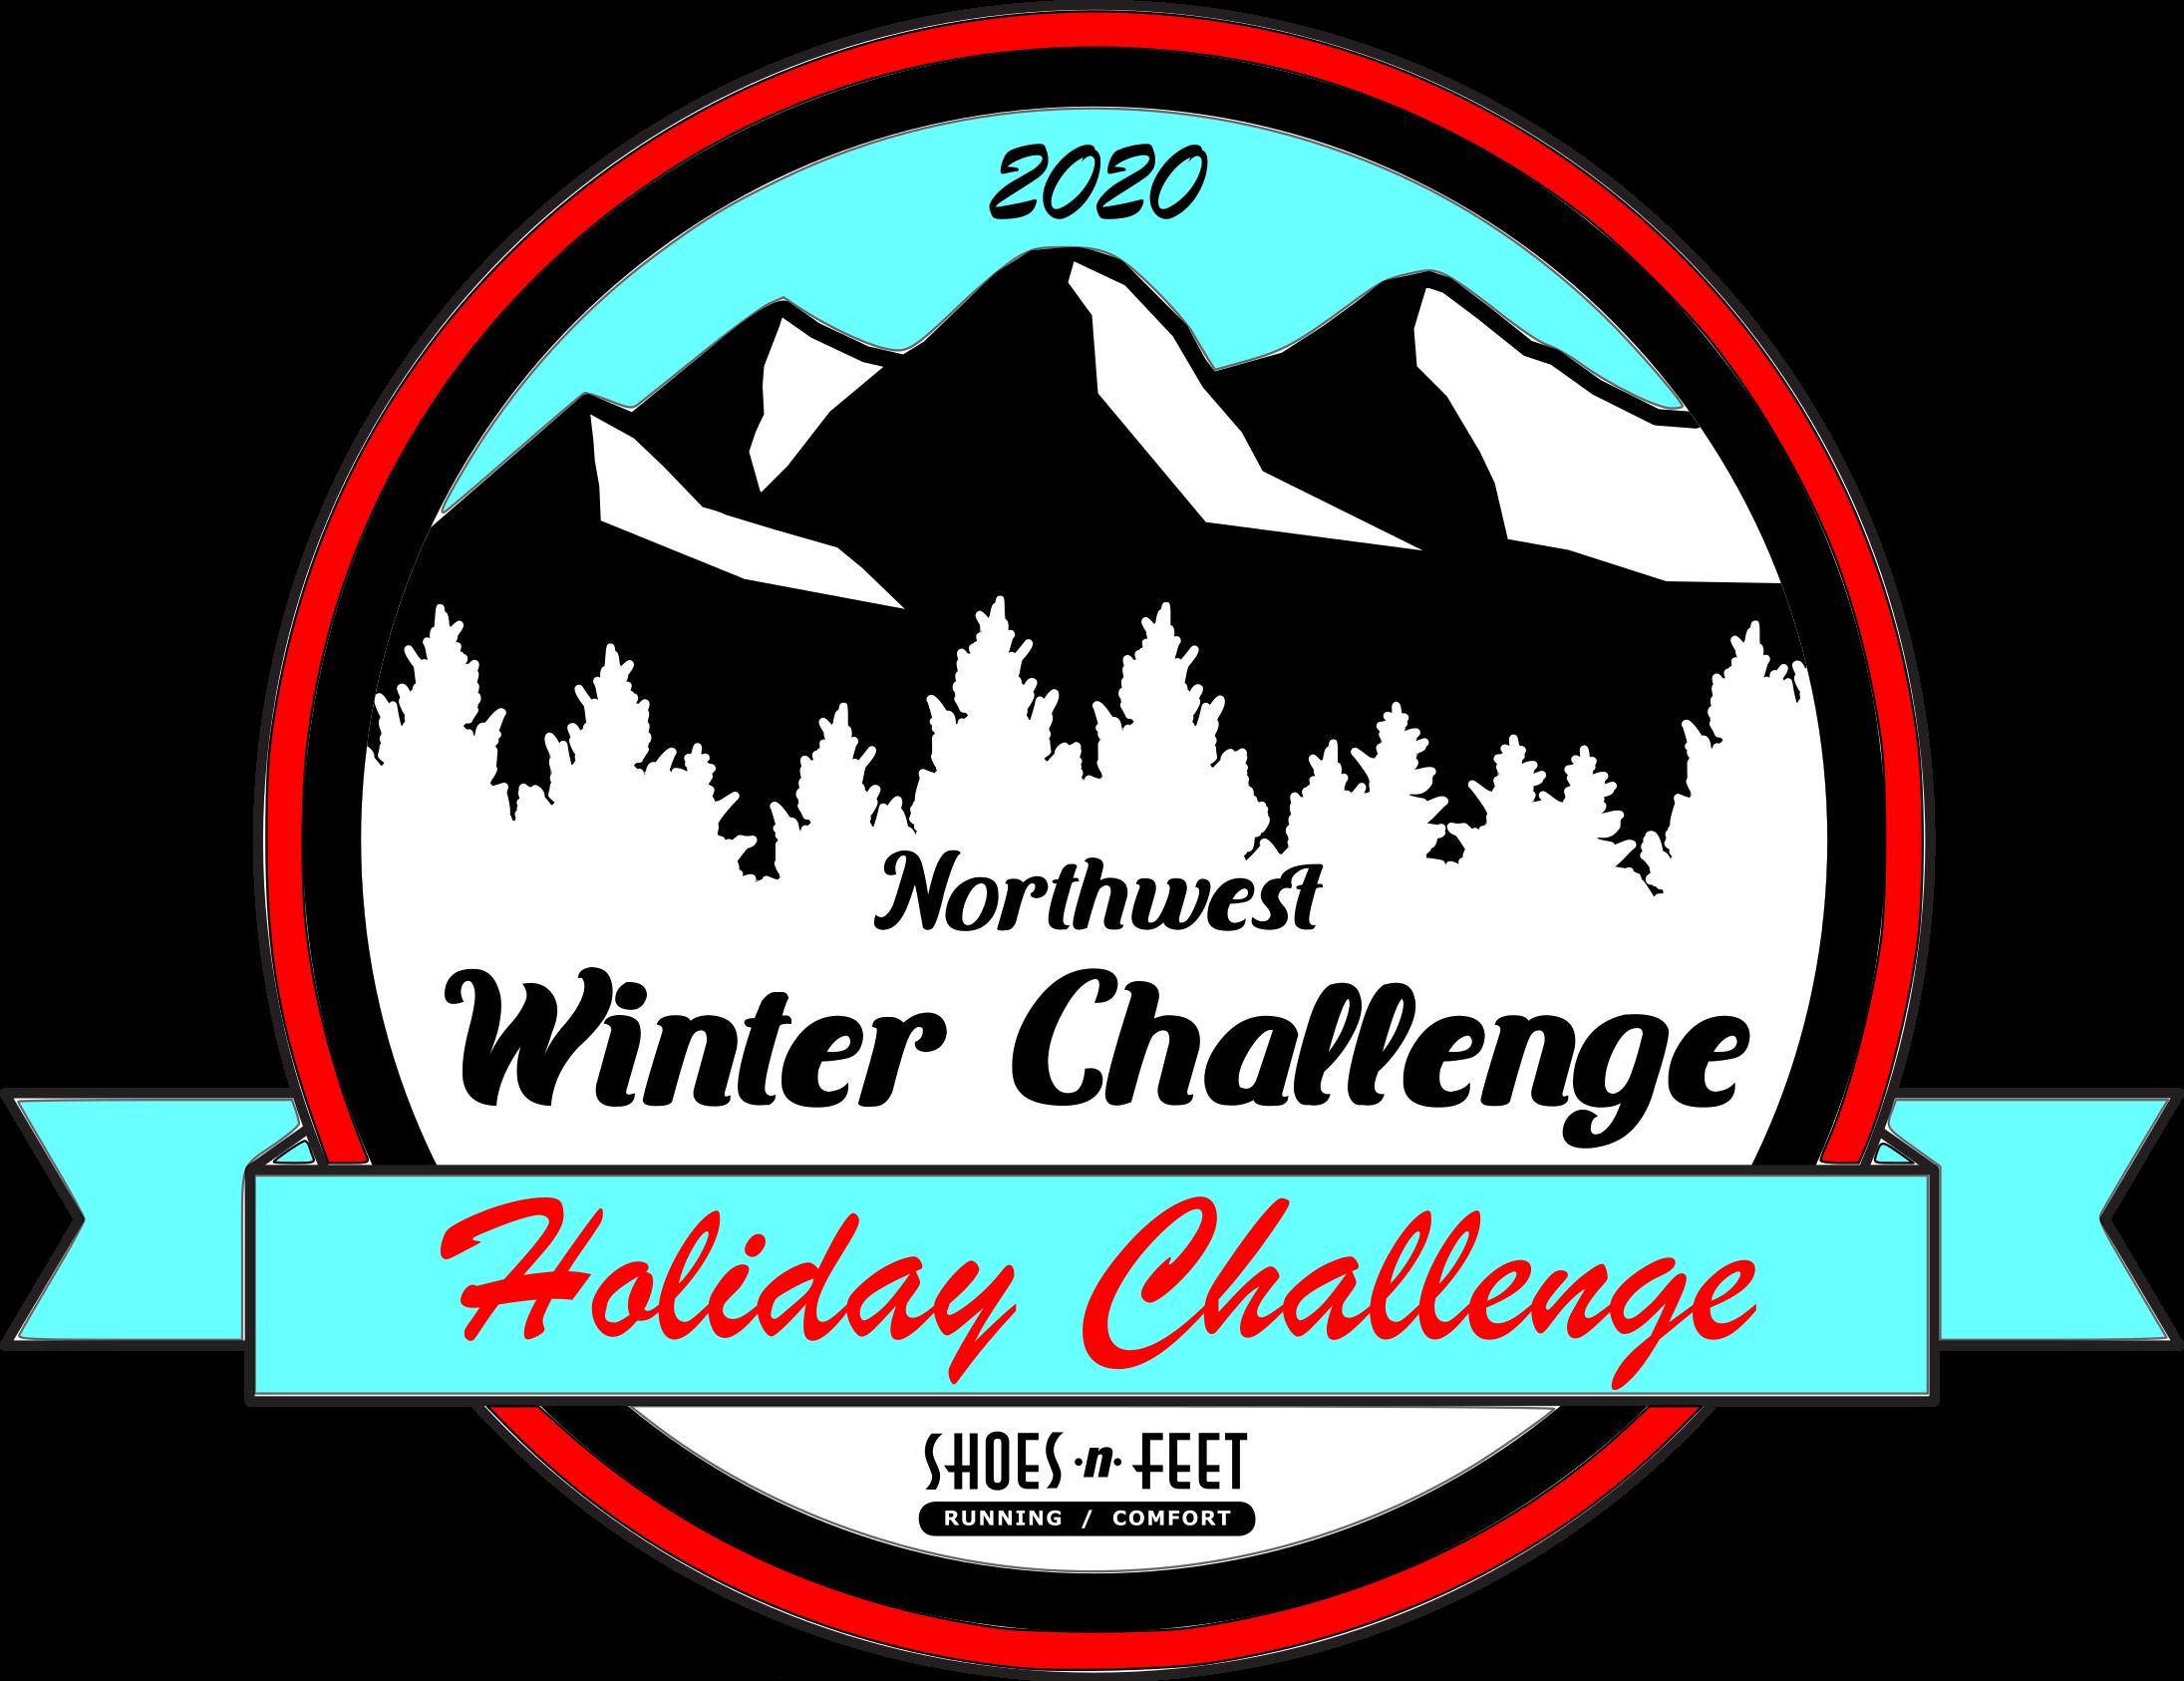 2020 holiday challenge logo